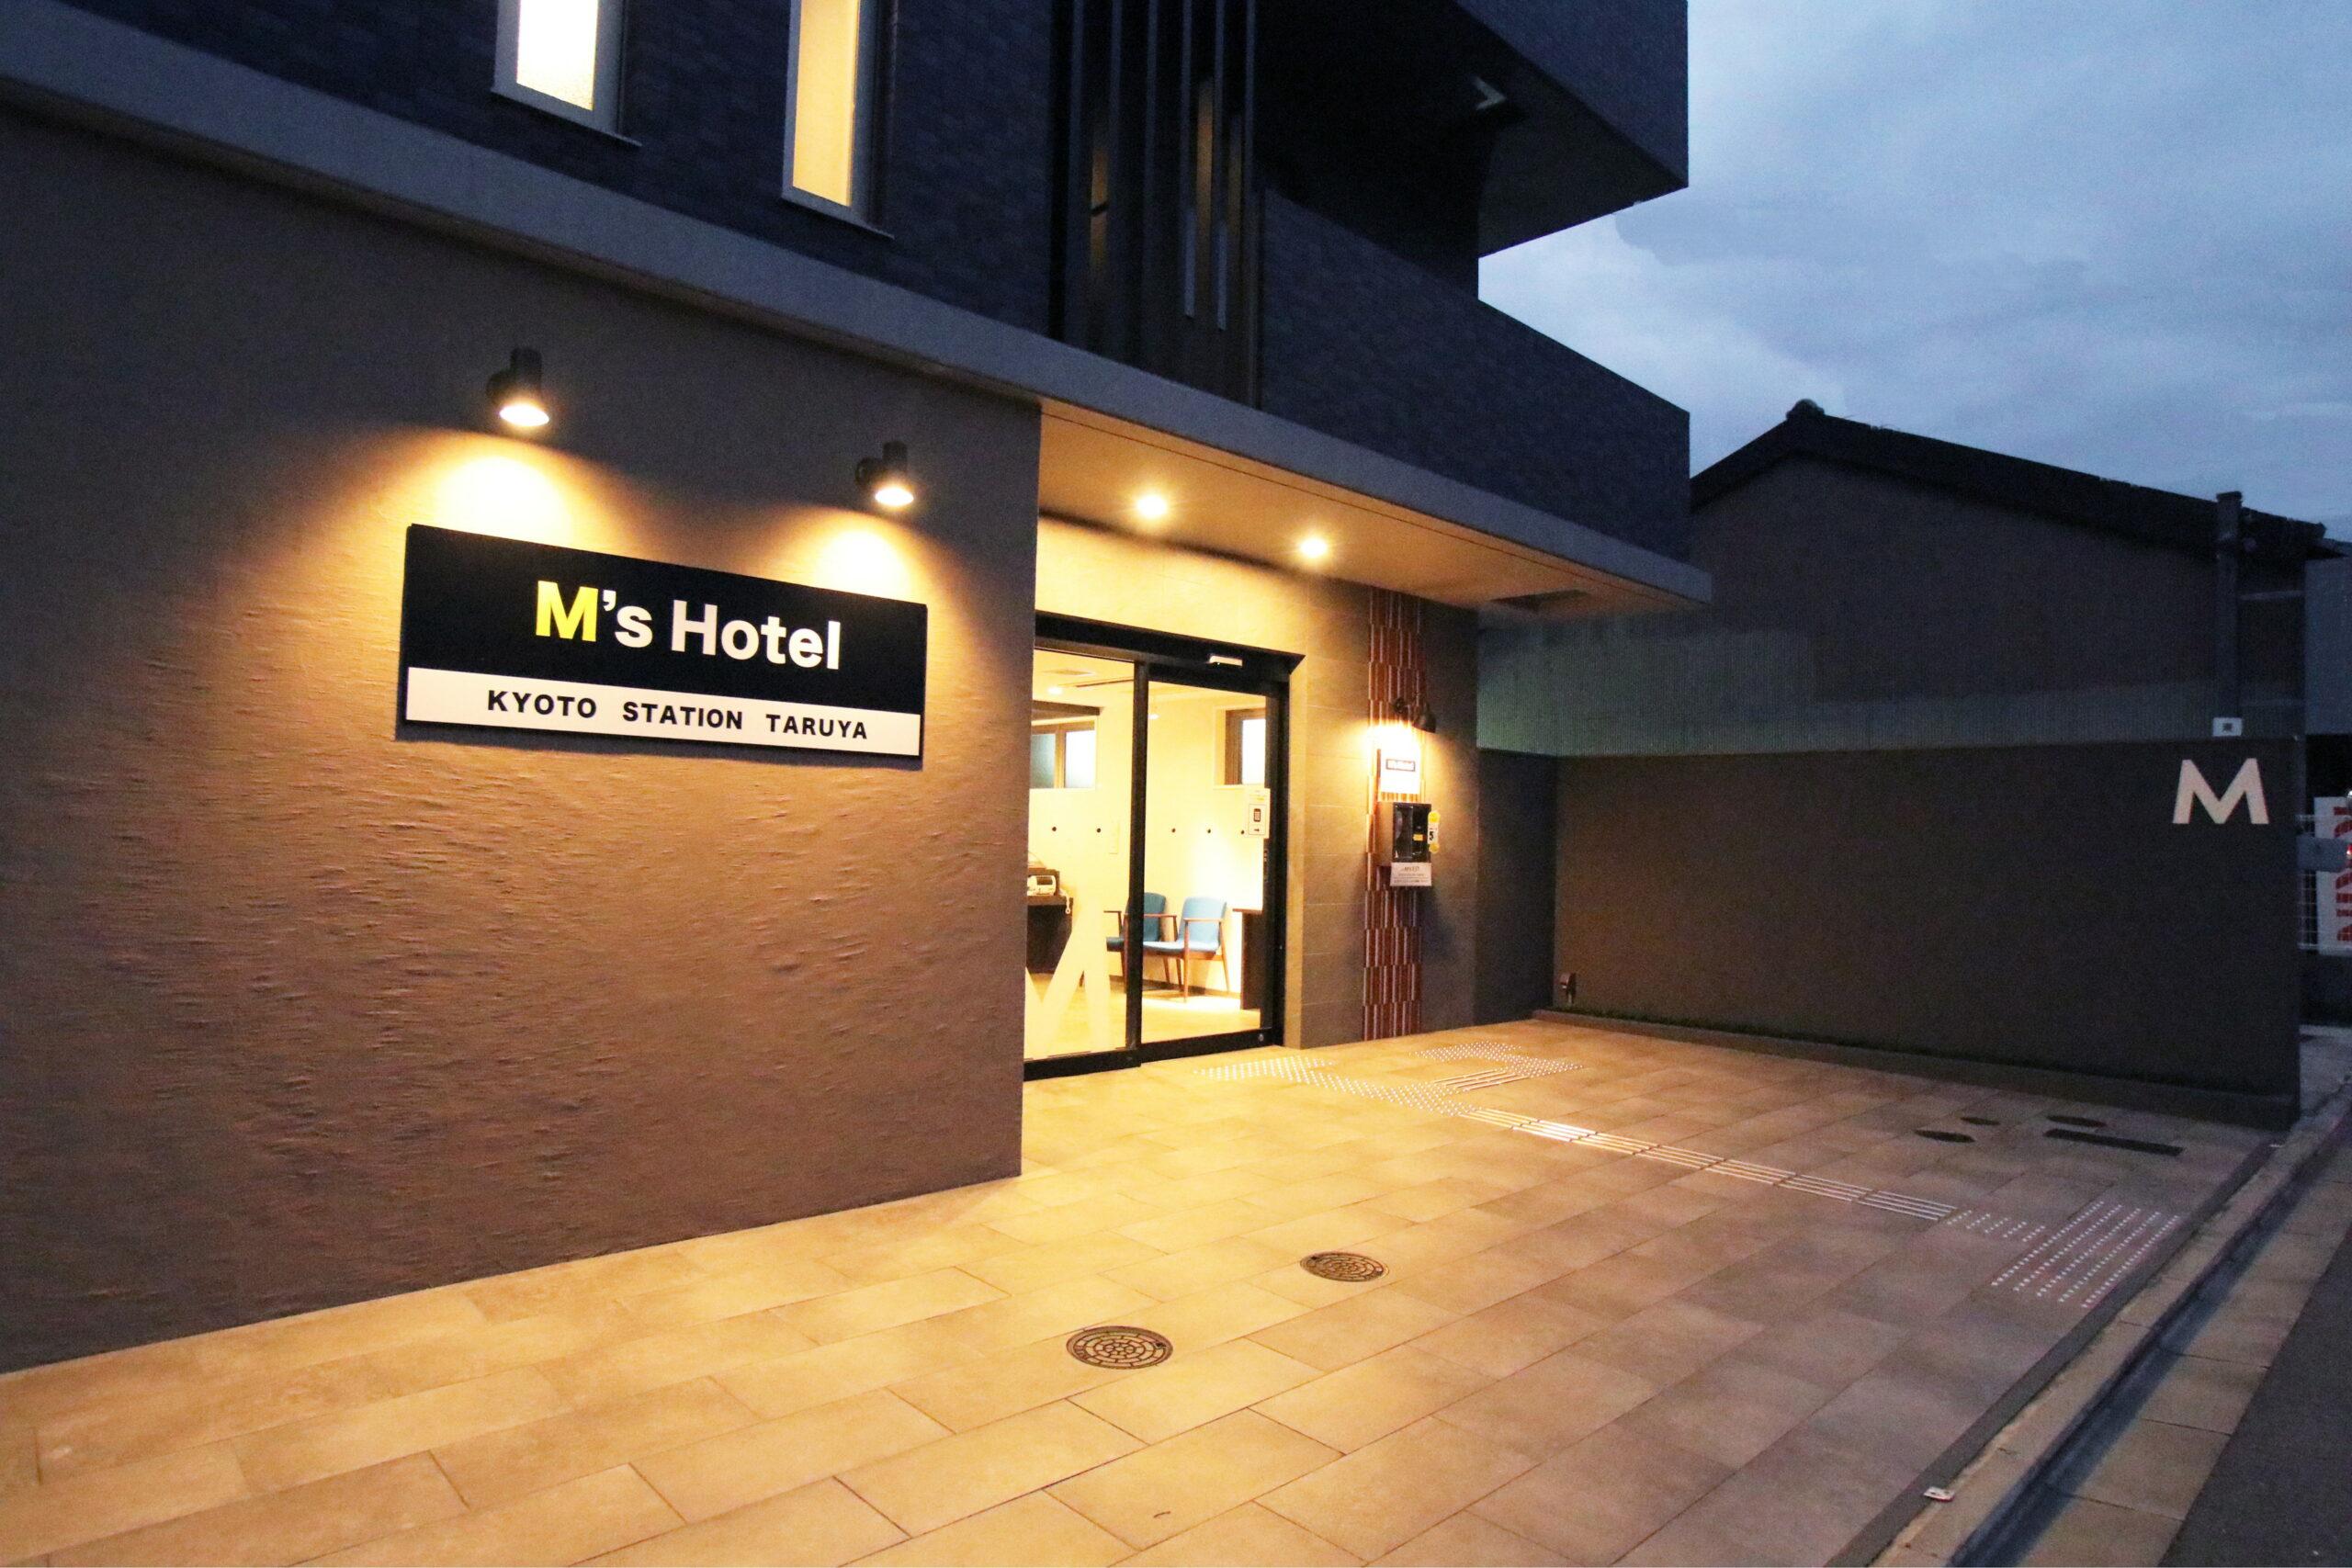 M's HOTEL KYOTO STATION TARUYA